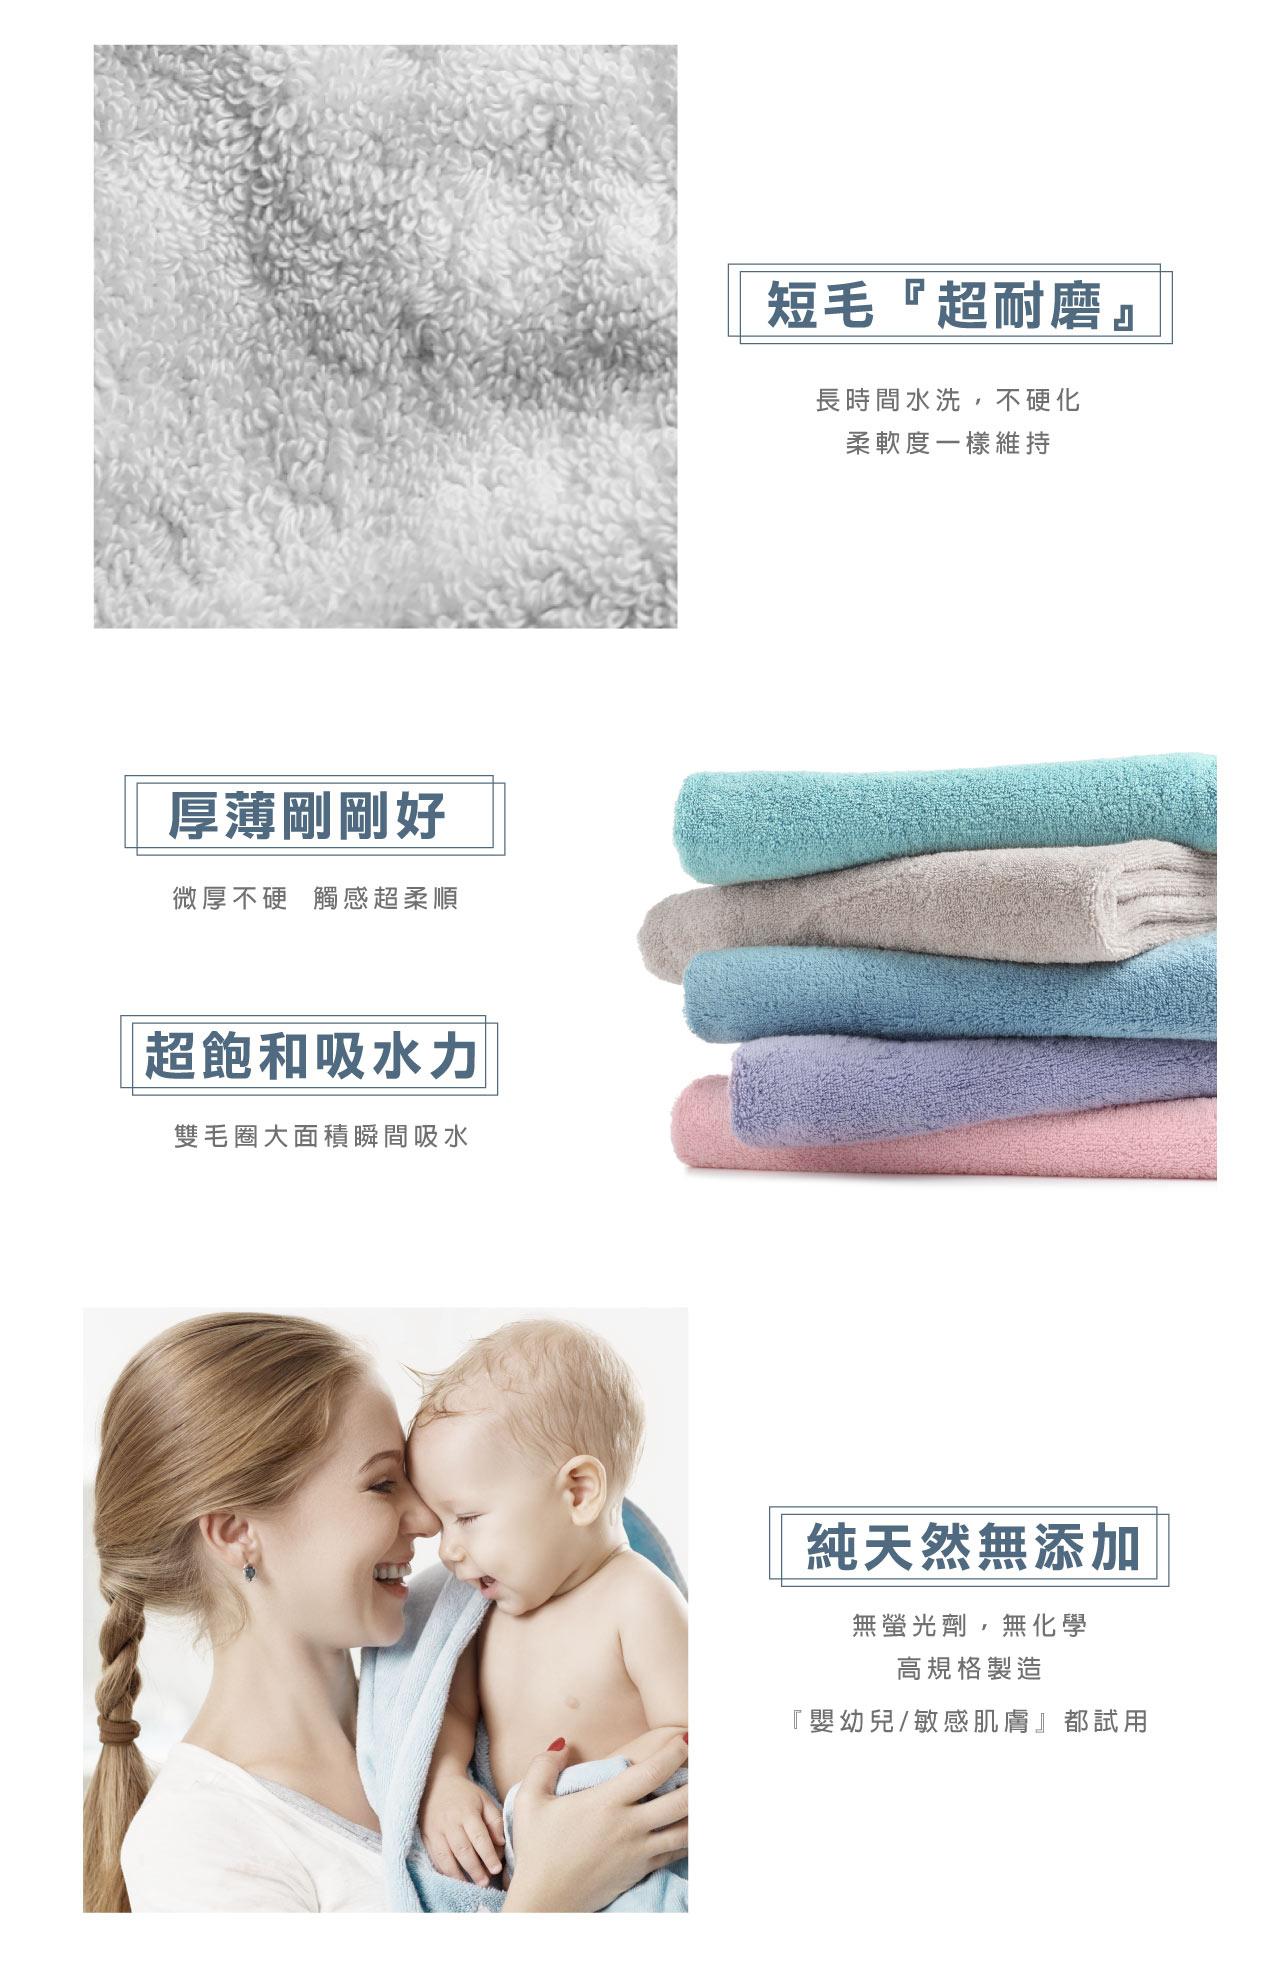 【Non-no台灣製】超細柔吸水浴巾 - PAGE_05